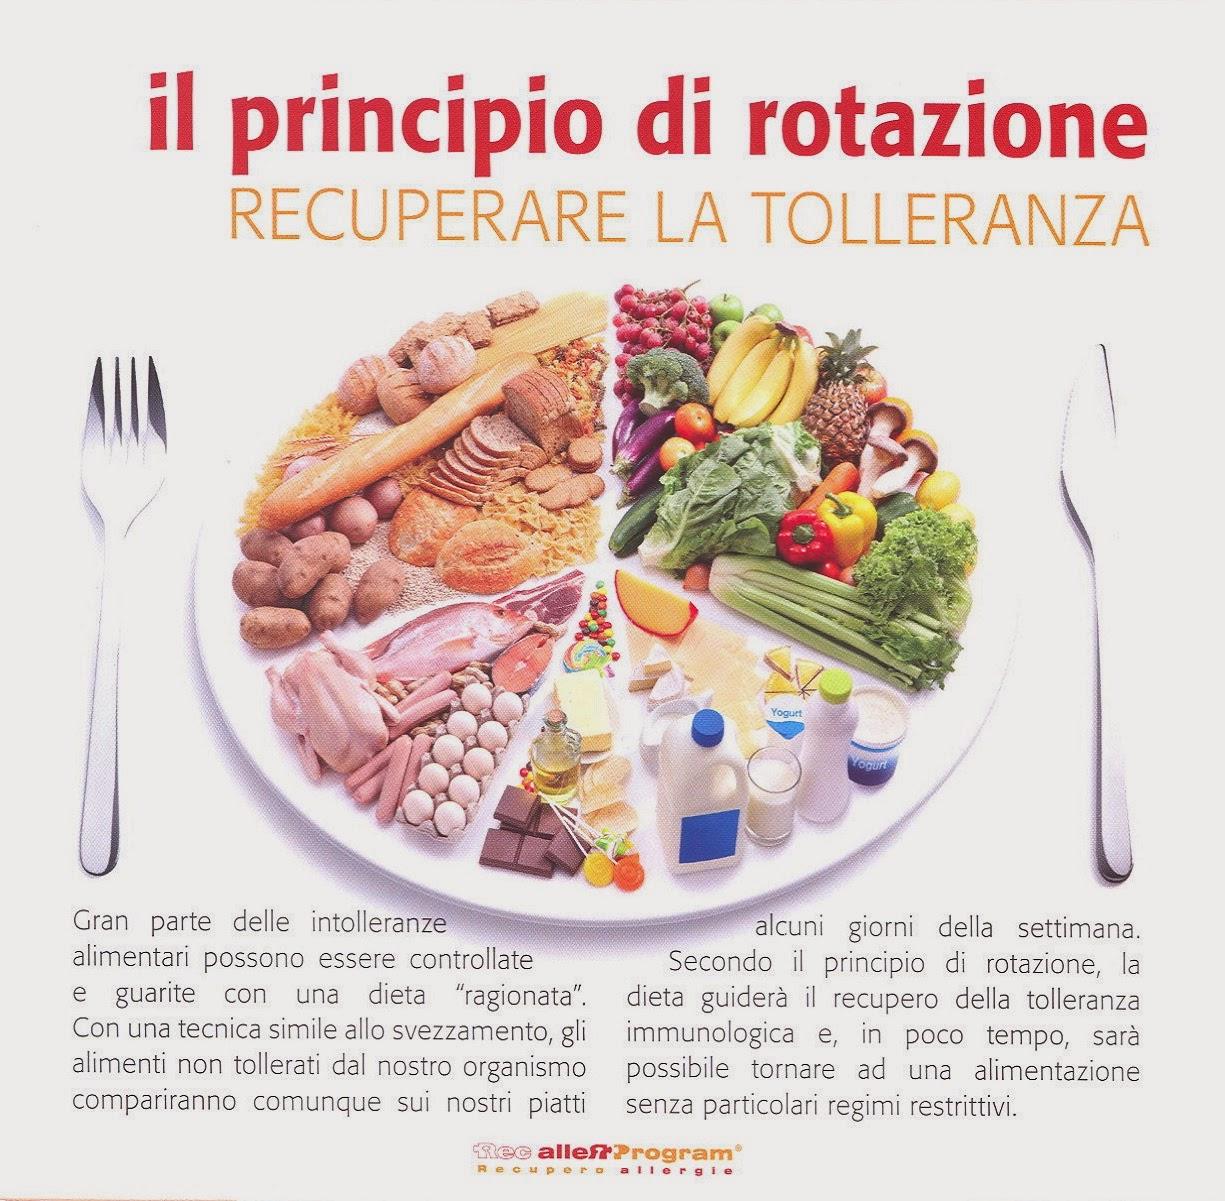 I Test Per Le Intolleranze Alimentari Verità O Bugia Dieta E Nutrizione Dr Bianchini